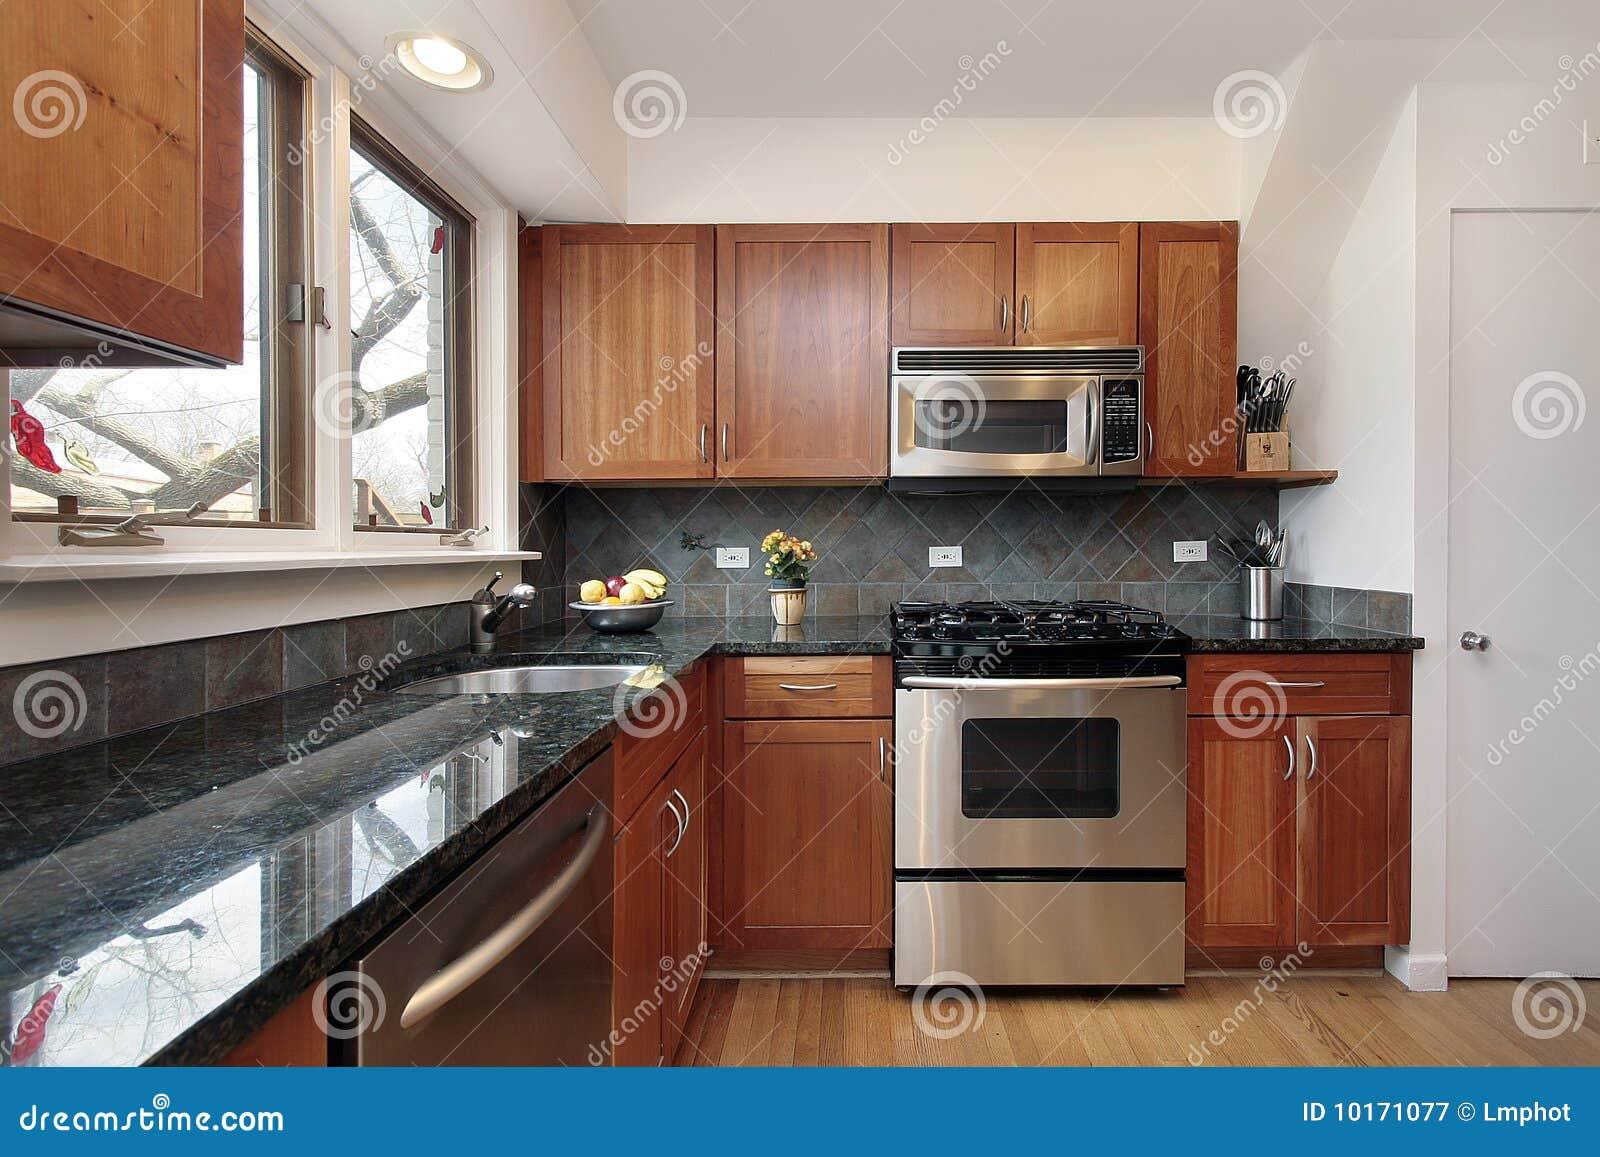 Berühmt Kirschholz Küchenschränke Bilder Bilder - Küche Set Ideen ...